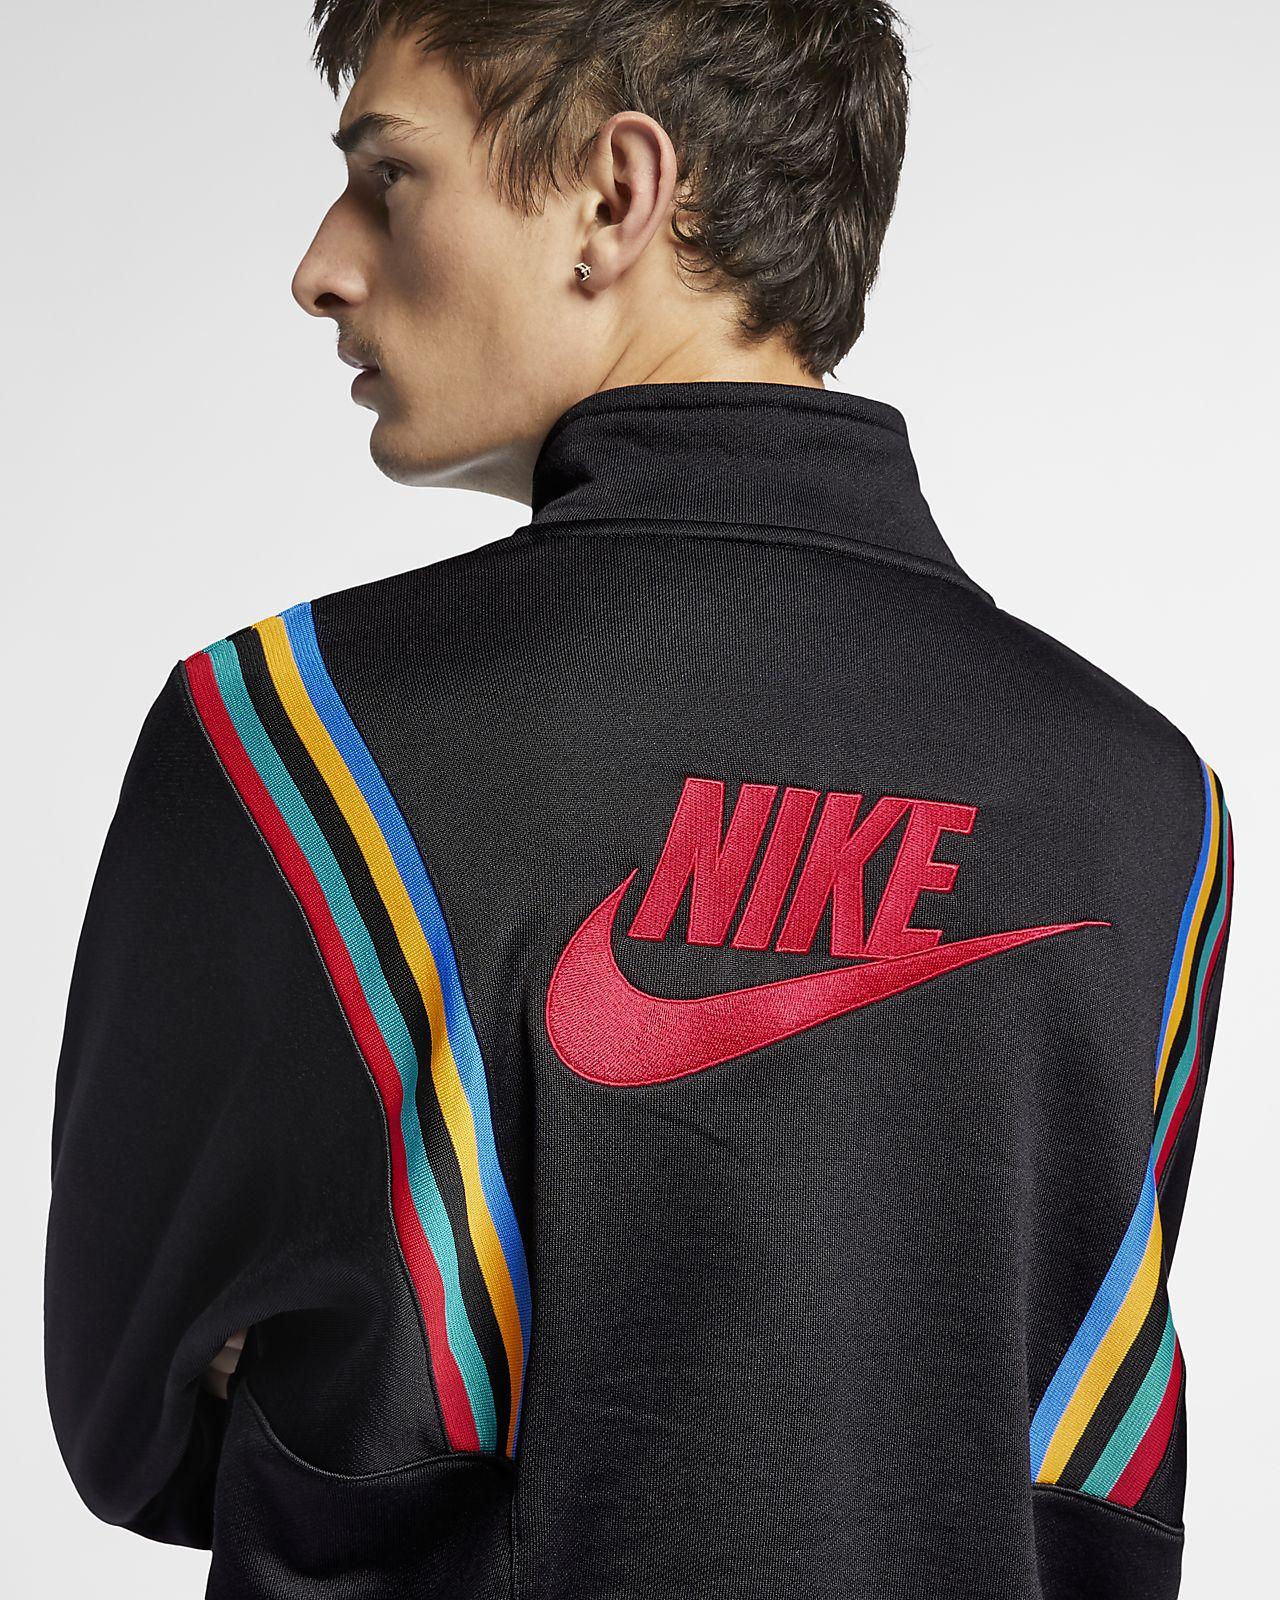 9e354c40d5 Nike Sportswear French Terry Jacket. Nike.com GB